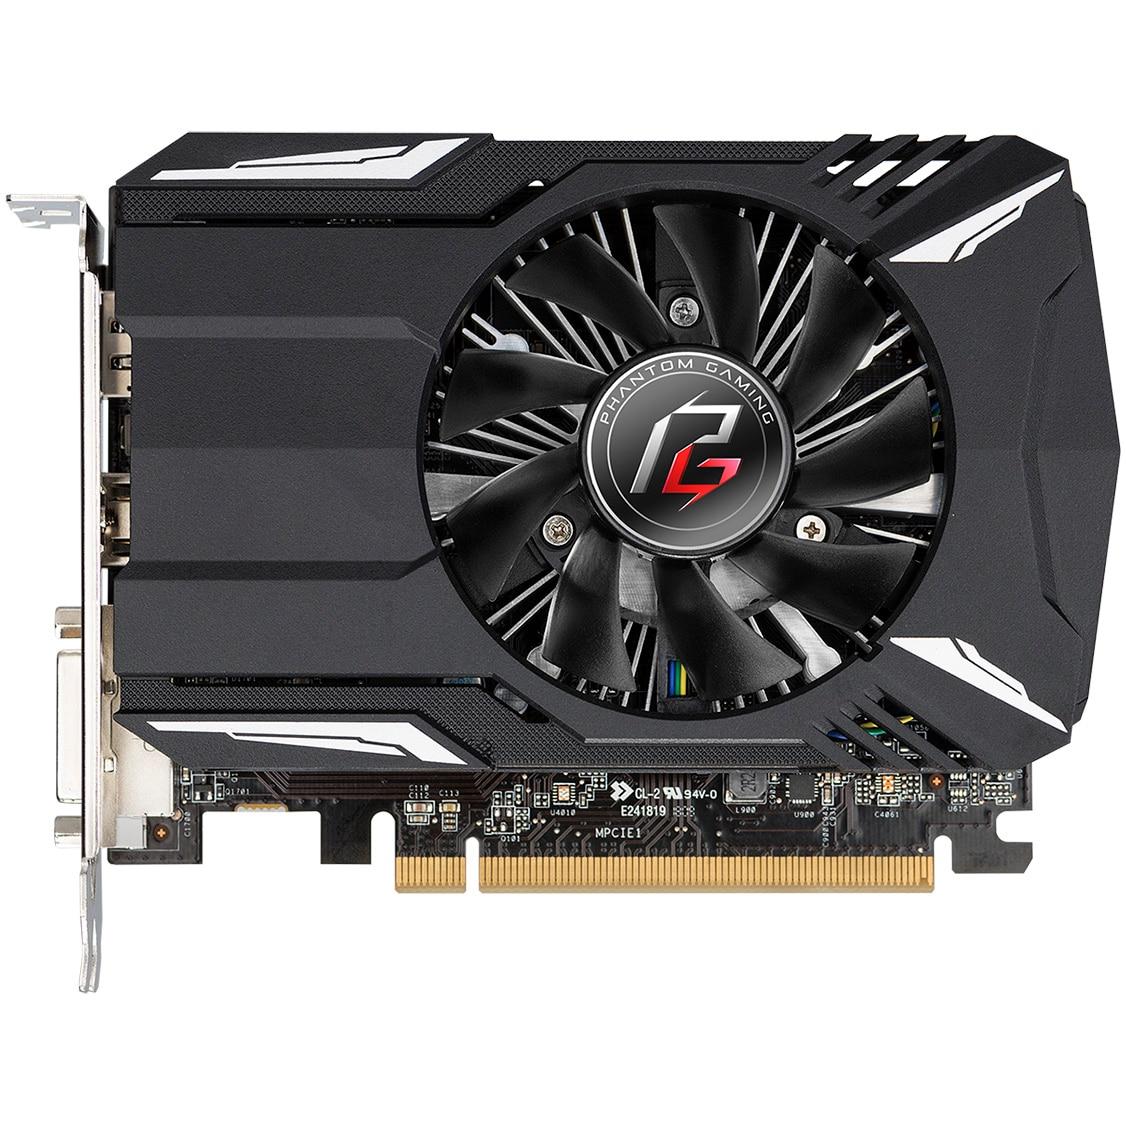 Fotografie Placa video ASRock Radeon™ RX 550 Phantom Gaming, 2GB GDDR5, 128 bit